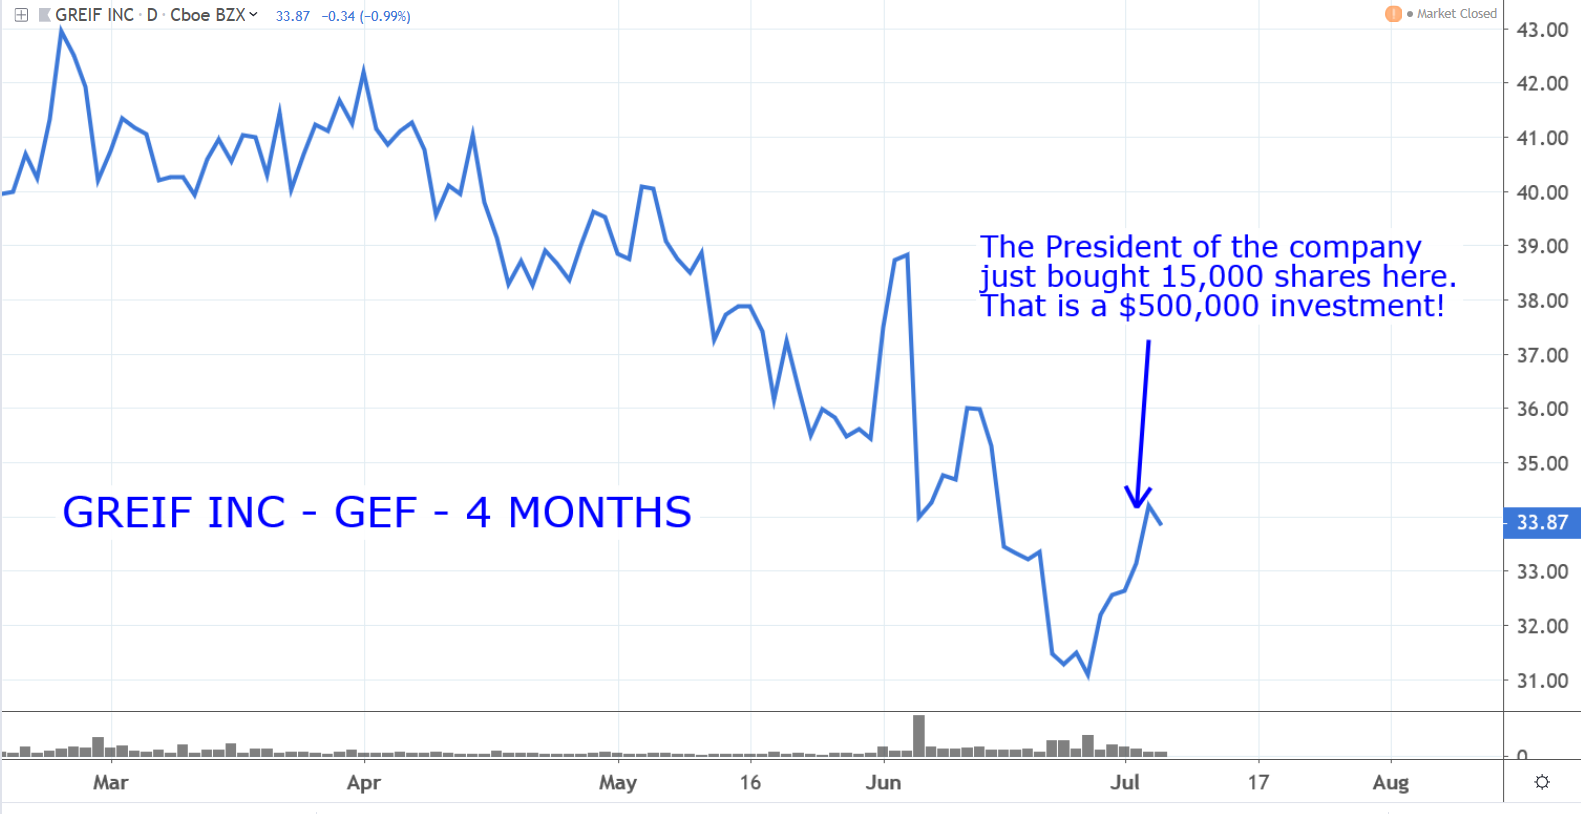 Stocks to Buy: Greif (GEF)